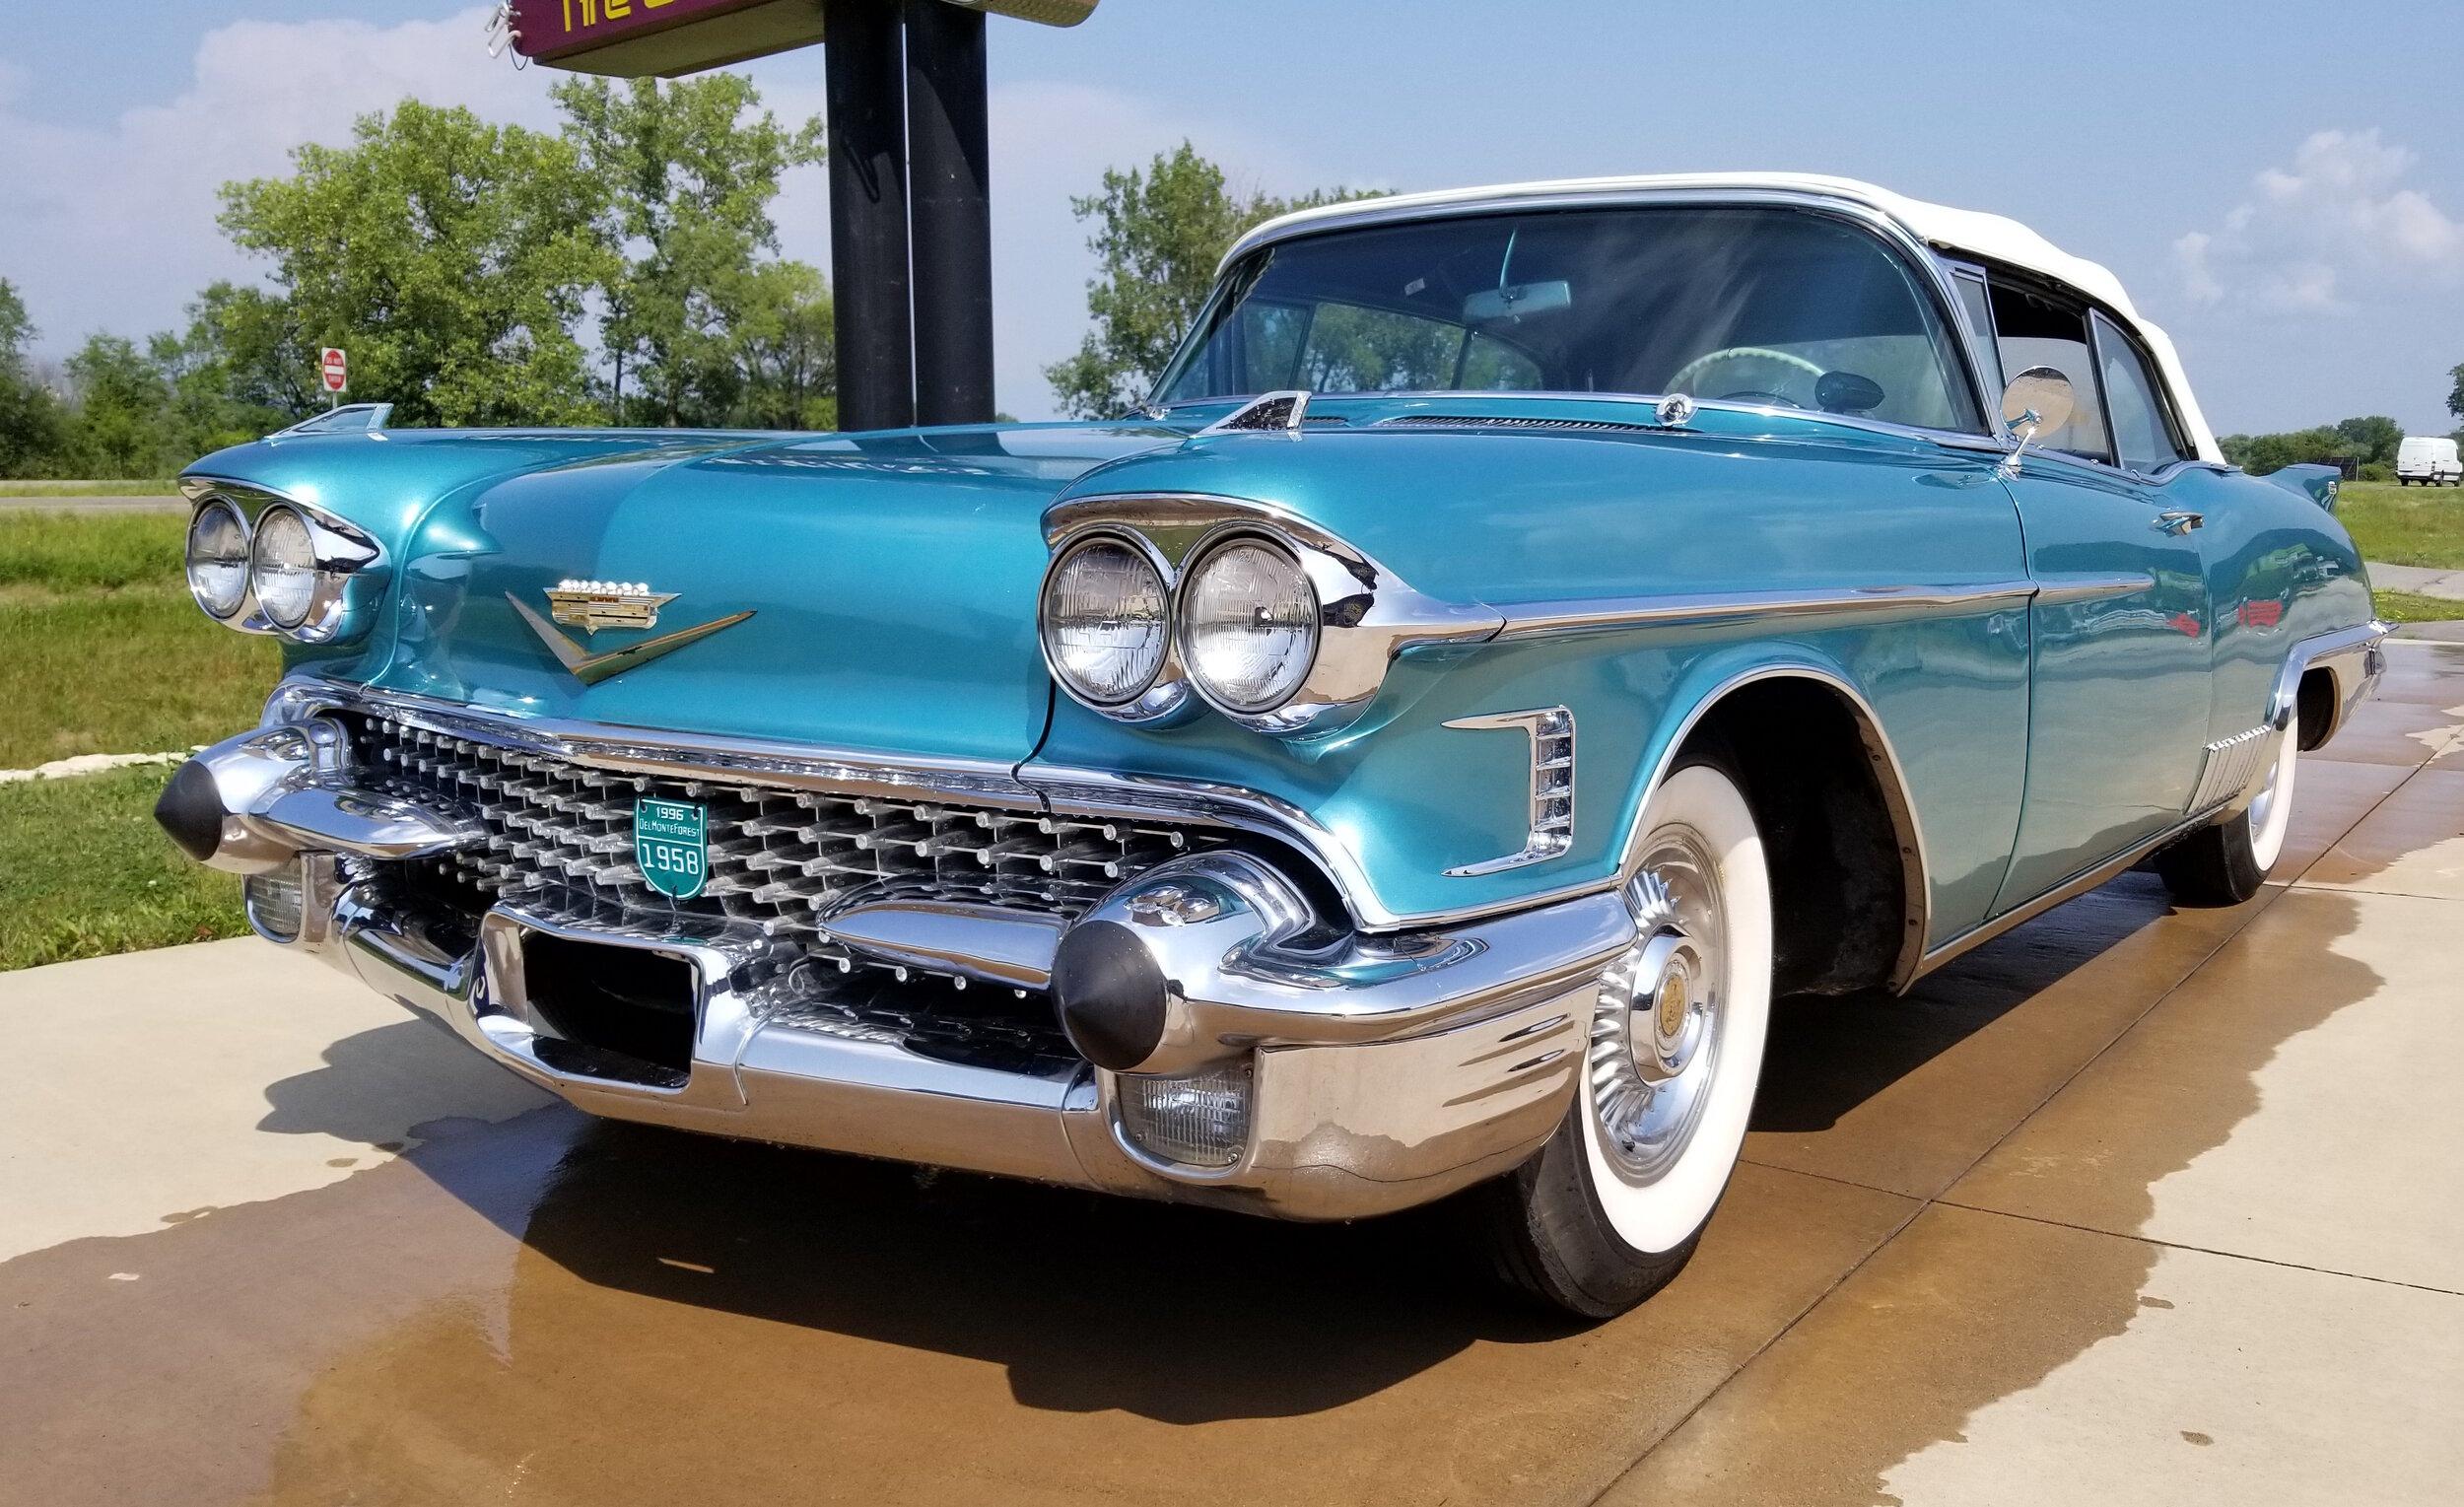 1 1958 Cadillac Biarritz.jpg